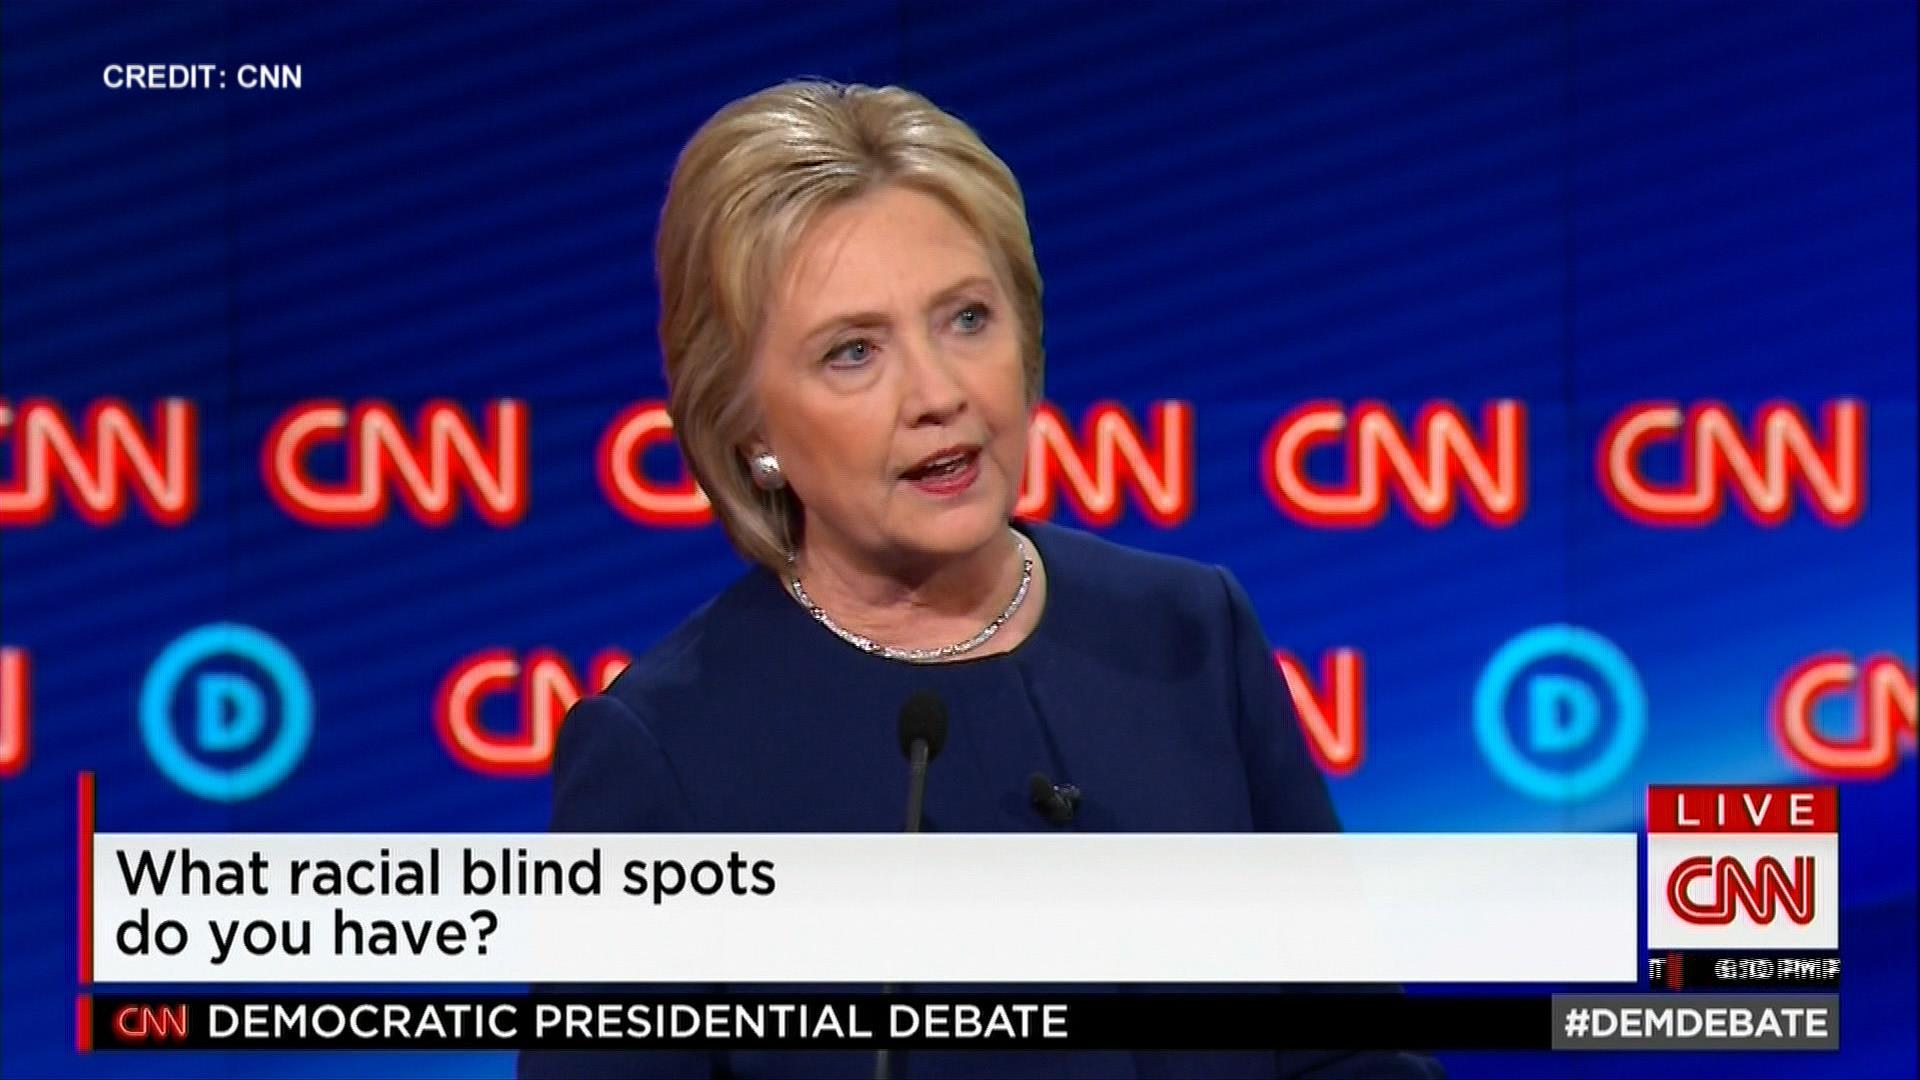 Hillary Clinton on Racial Blindspots